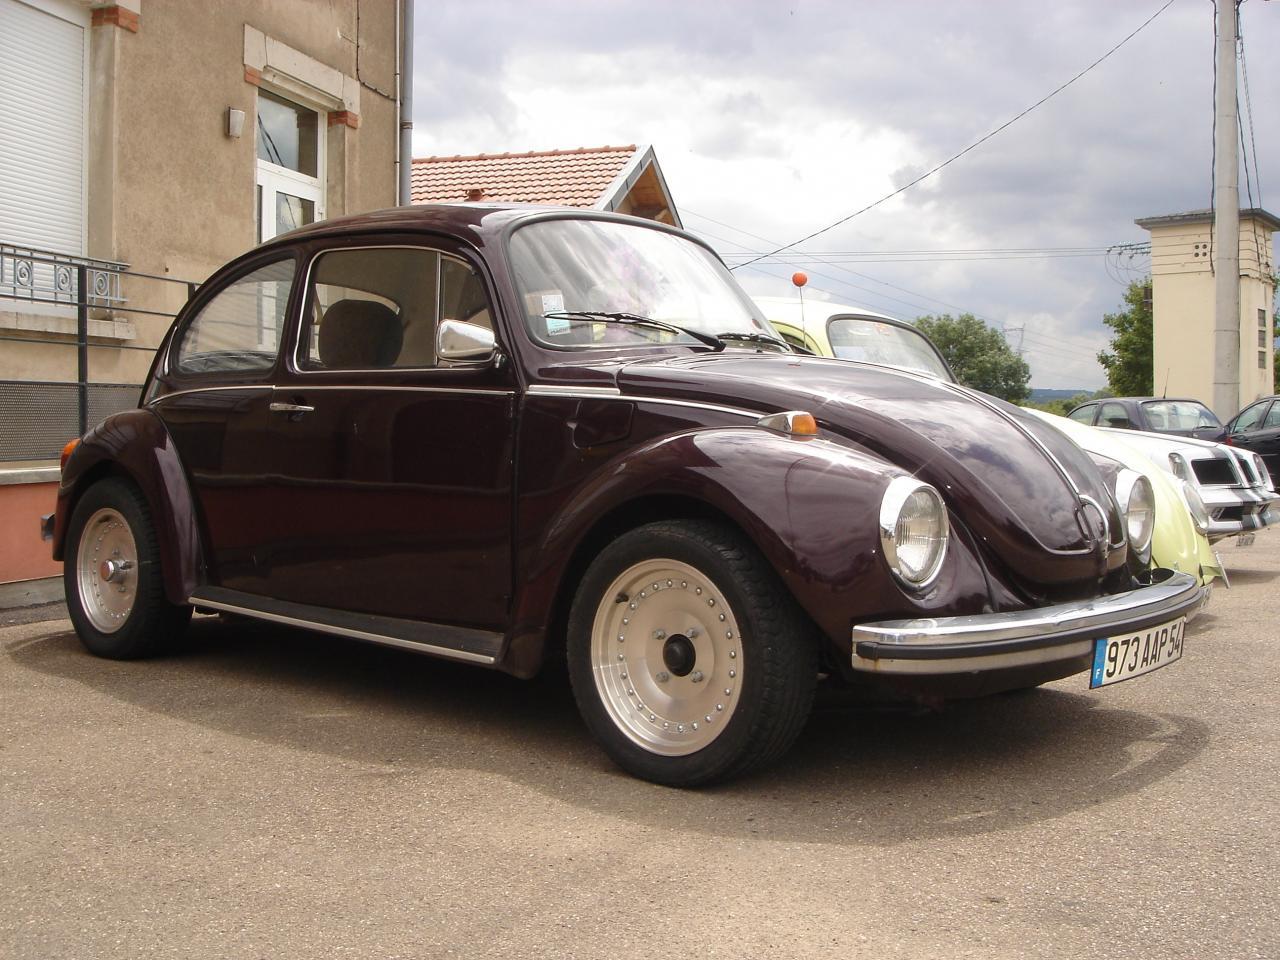 VW Cox 1303